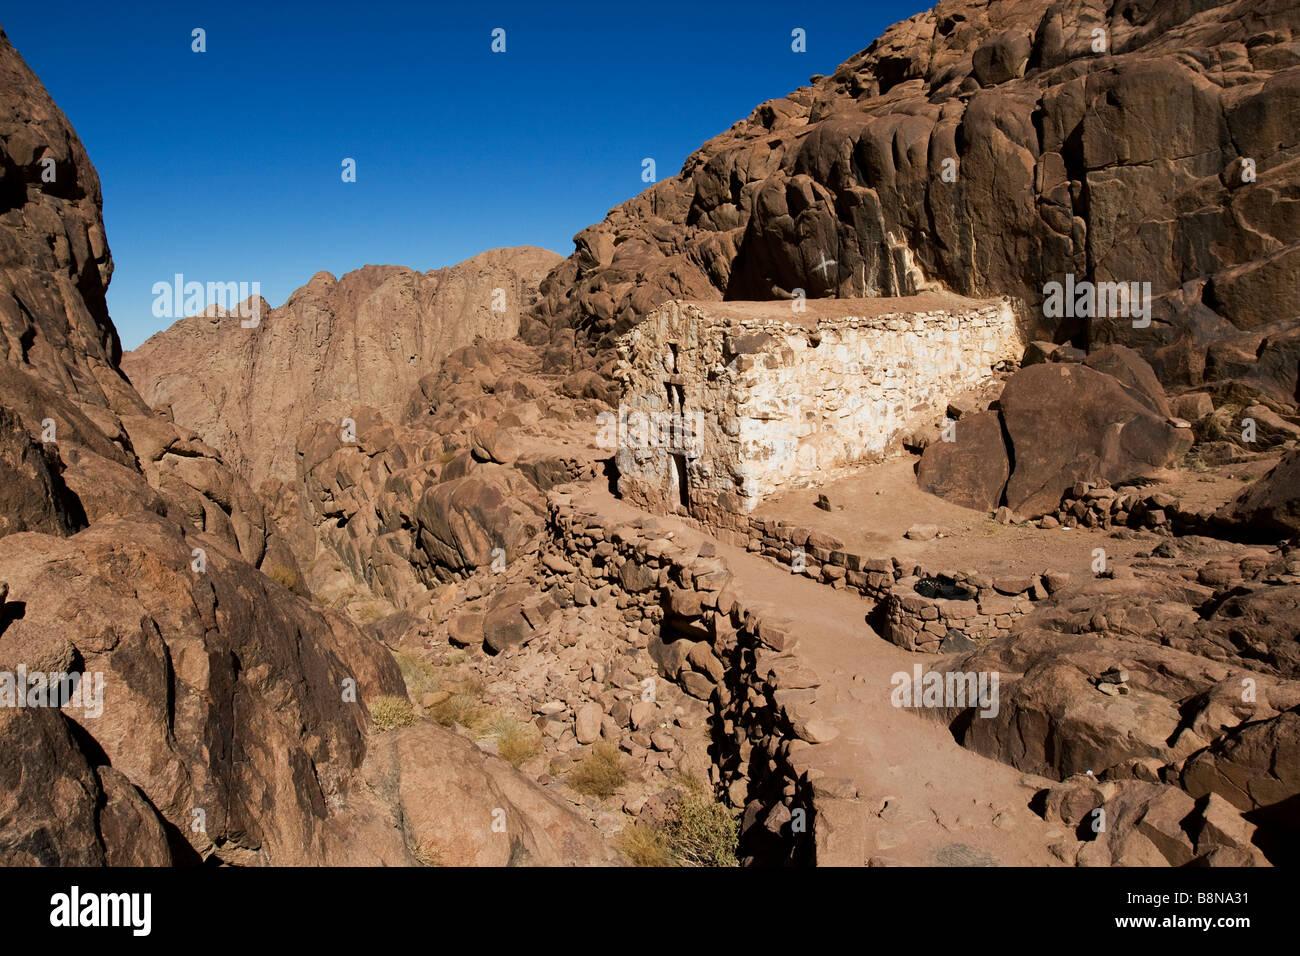 an old stone church on the way to the top to Mount Sinai, the mount of God, Sinai, Egypt - Stock Image